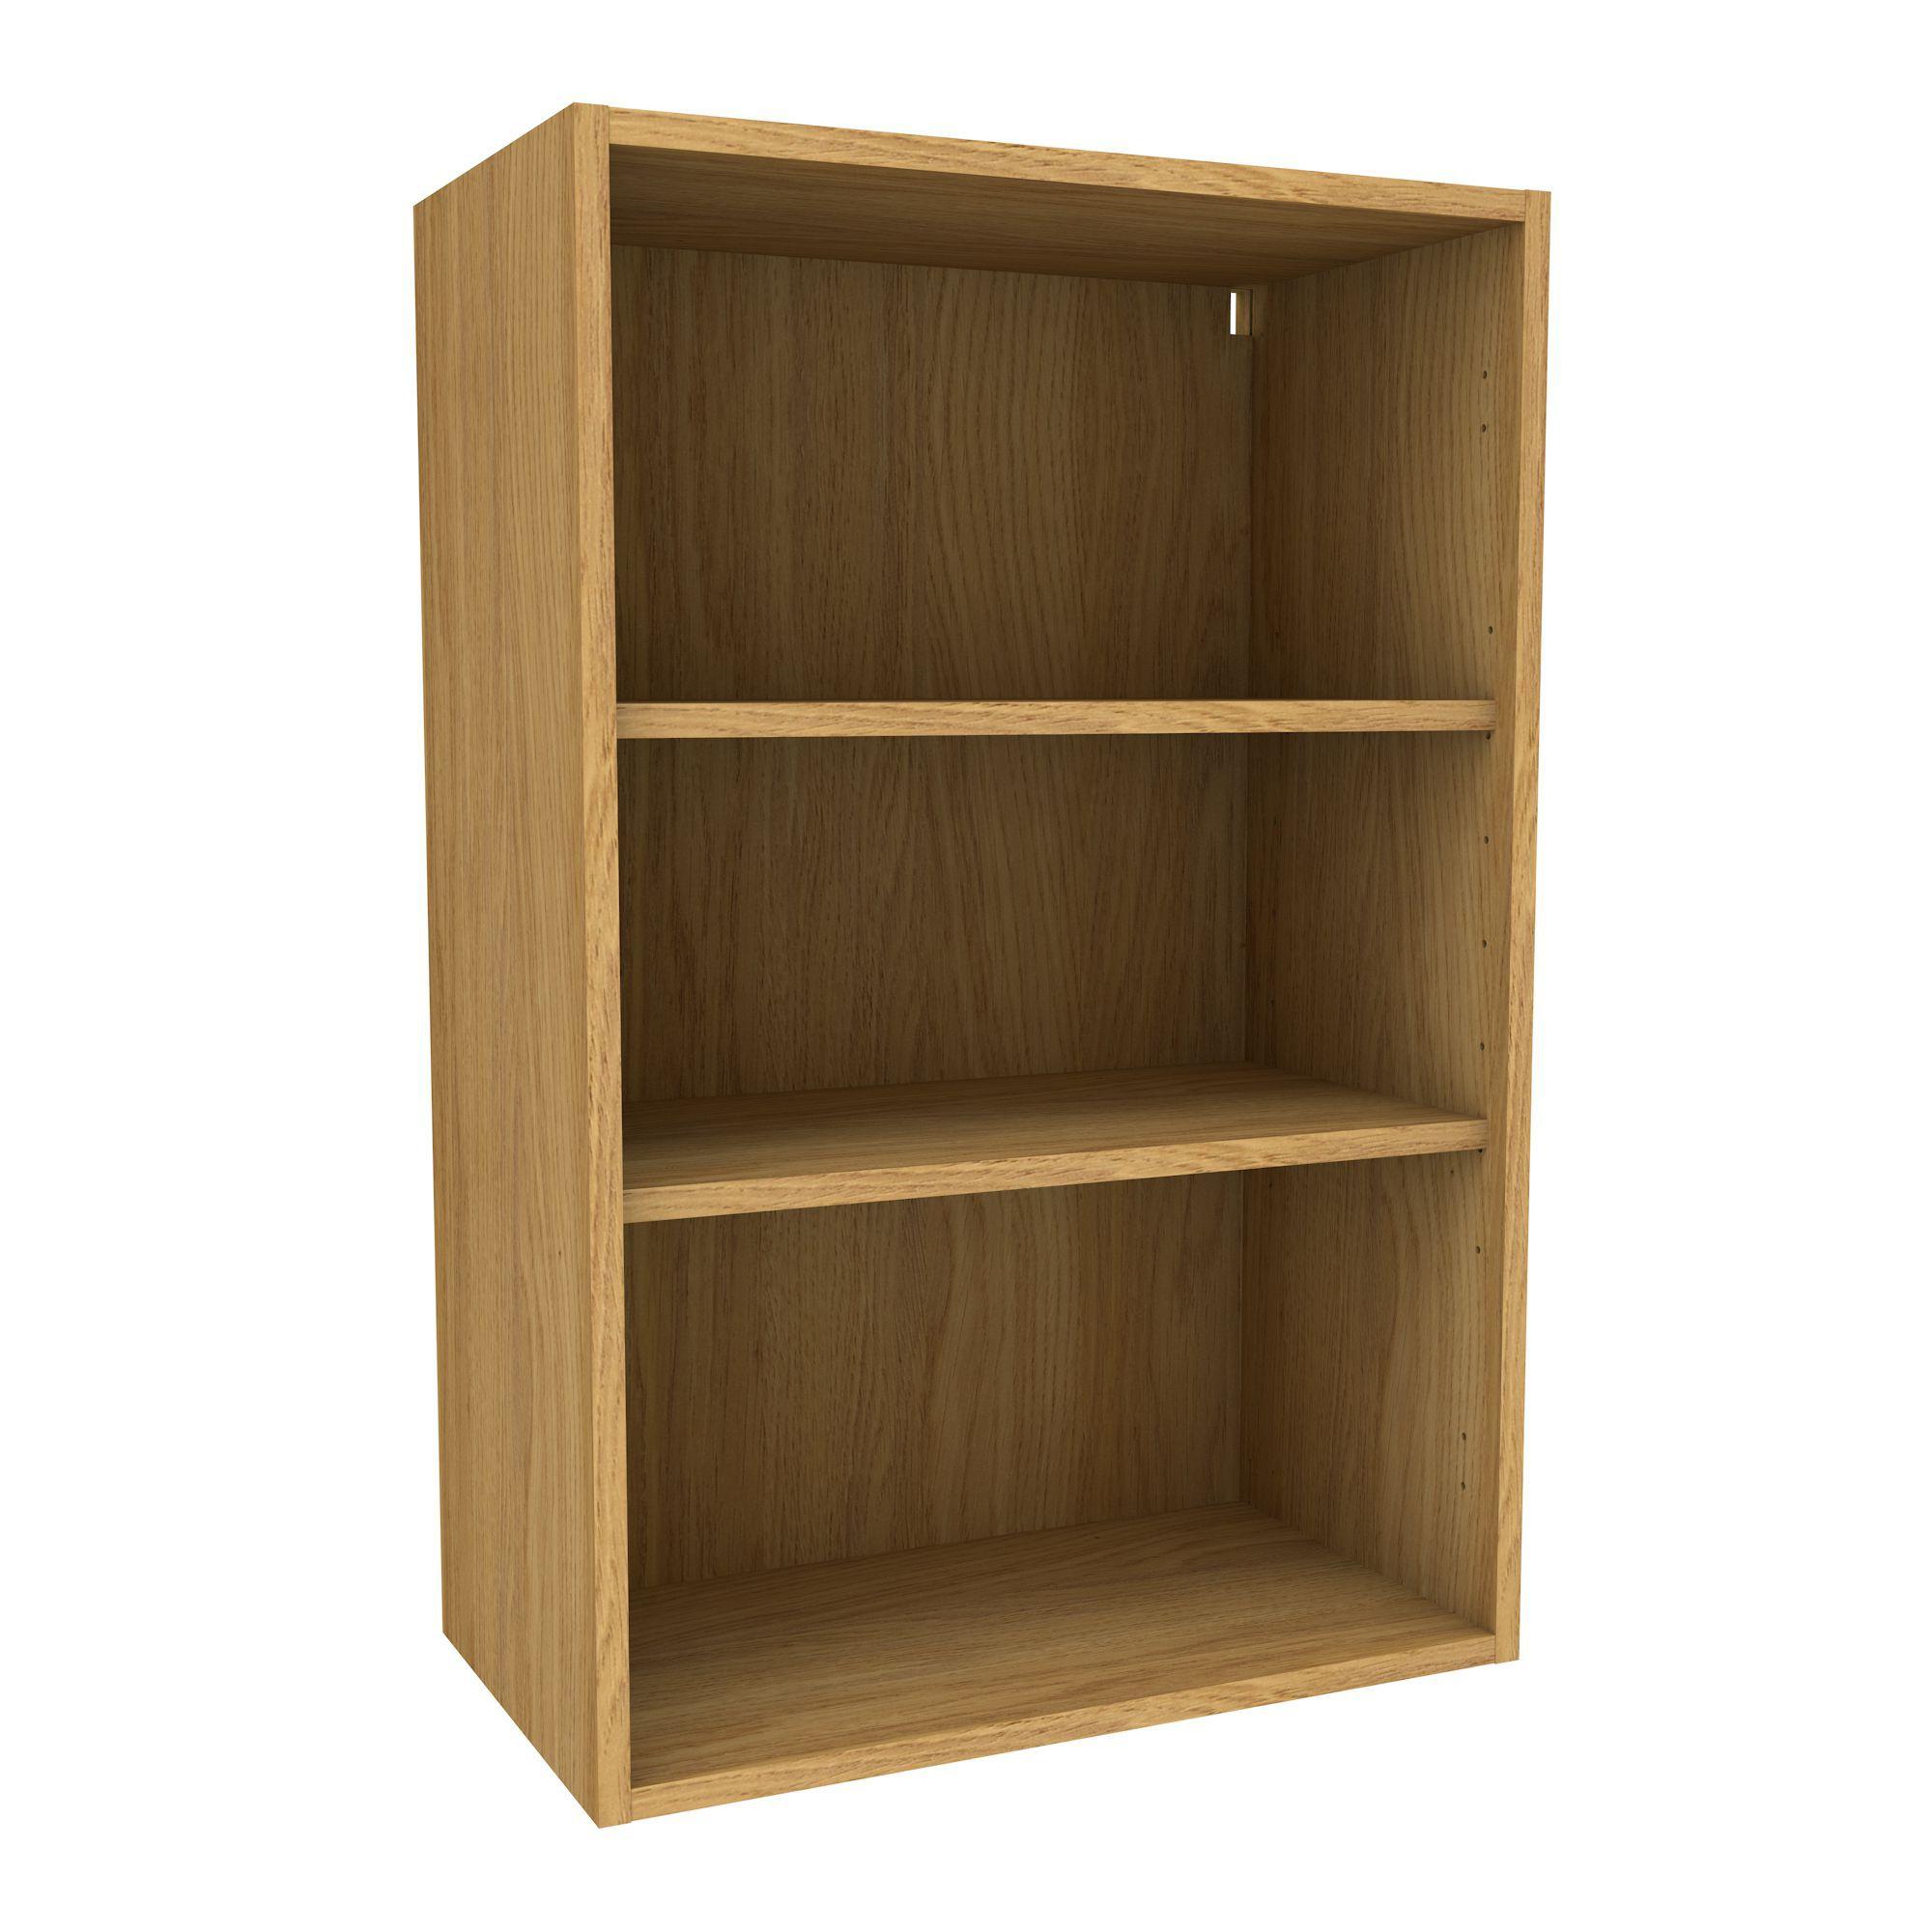 Cooke Lewis Oak Effect Kitchen Cabinet